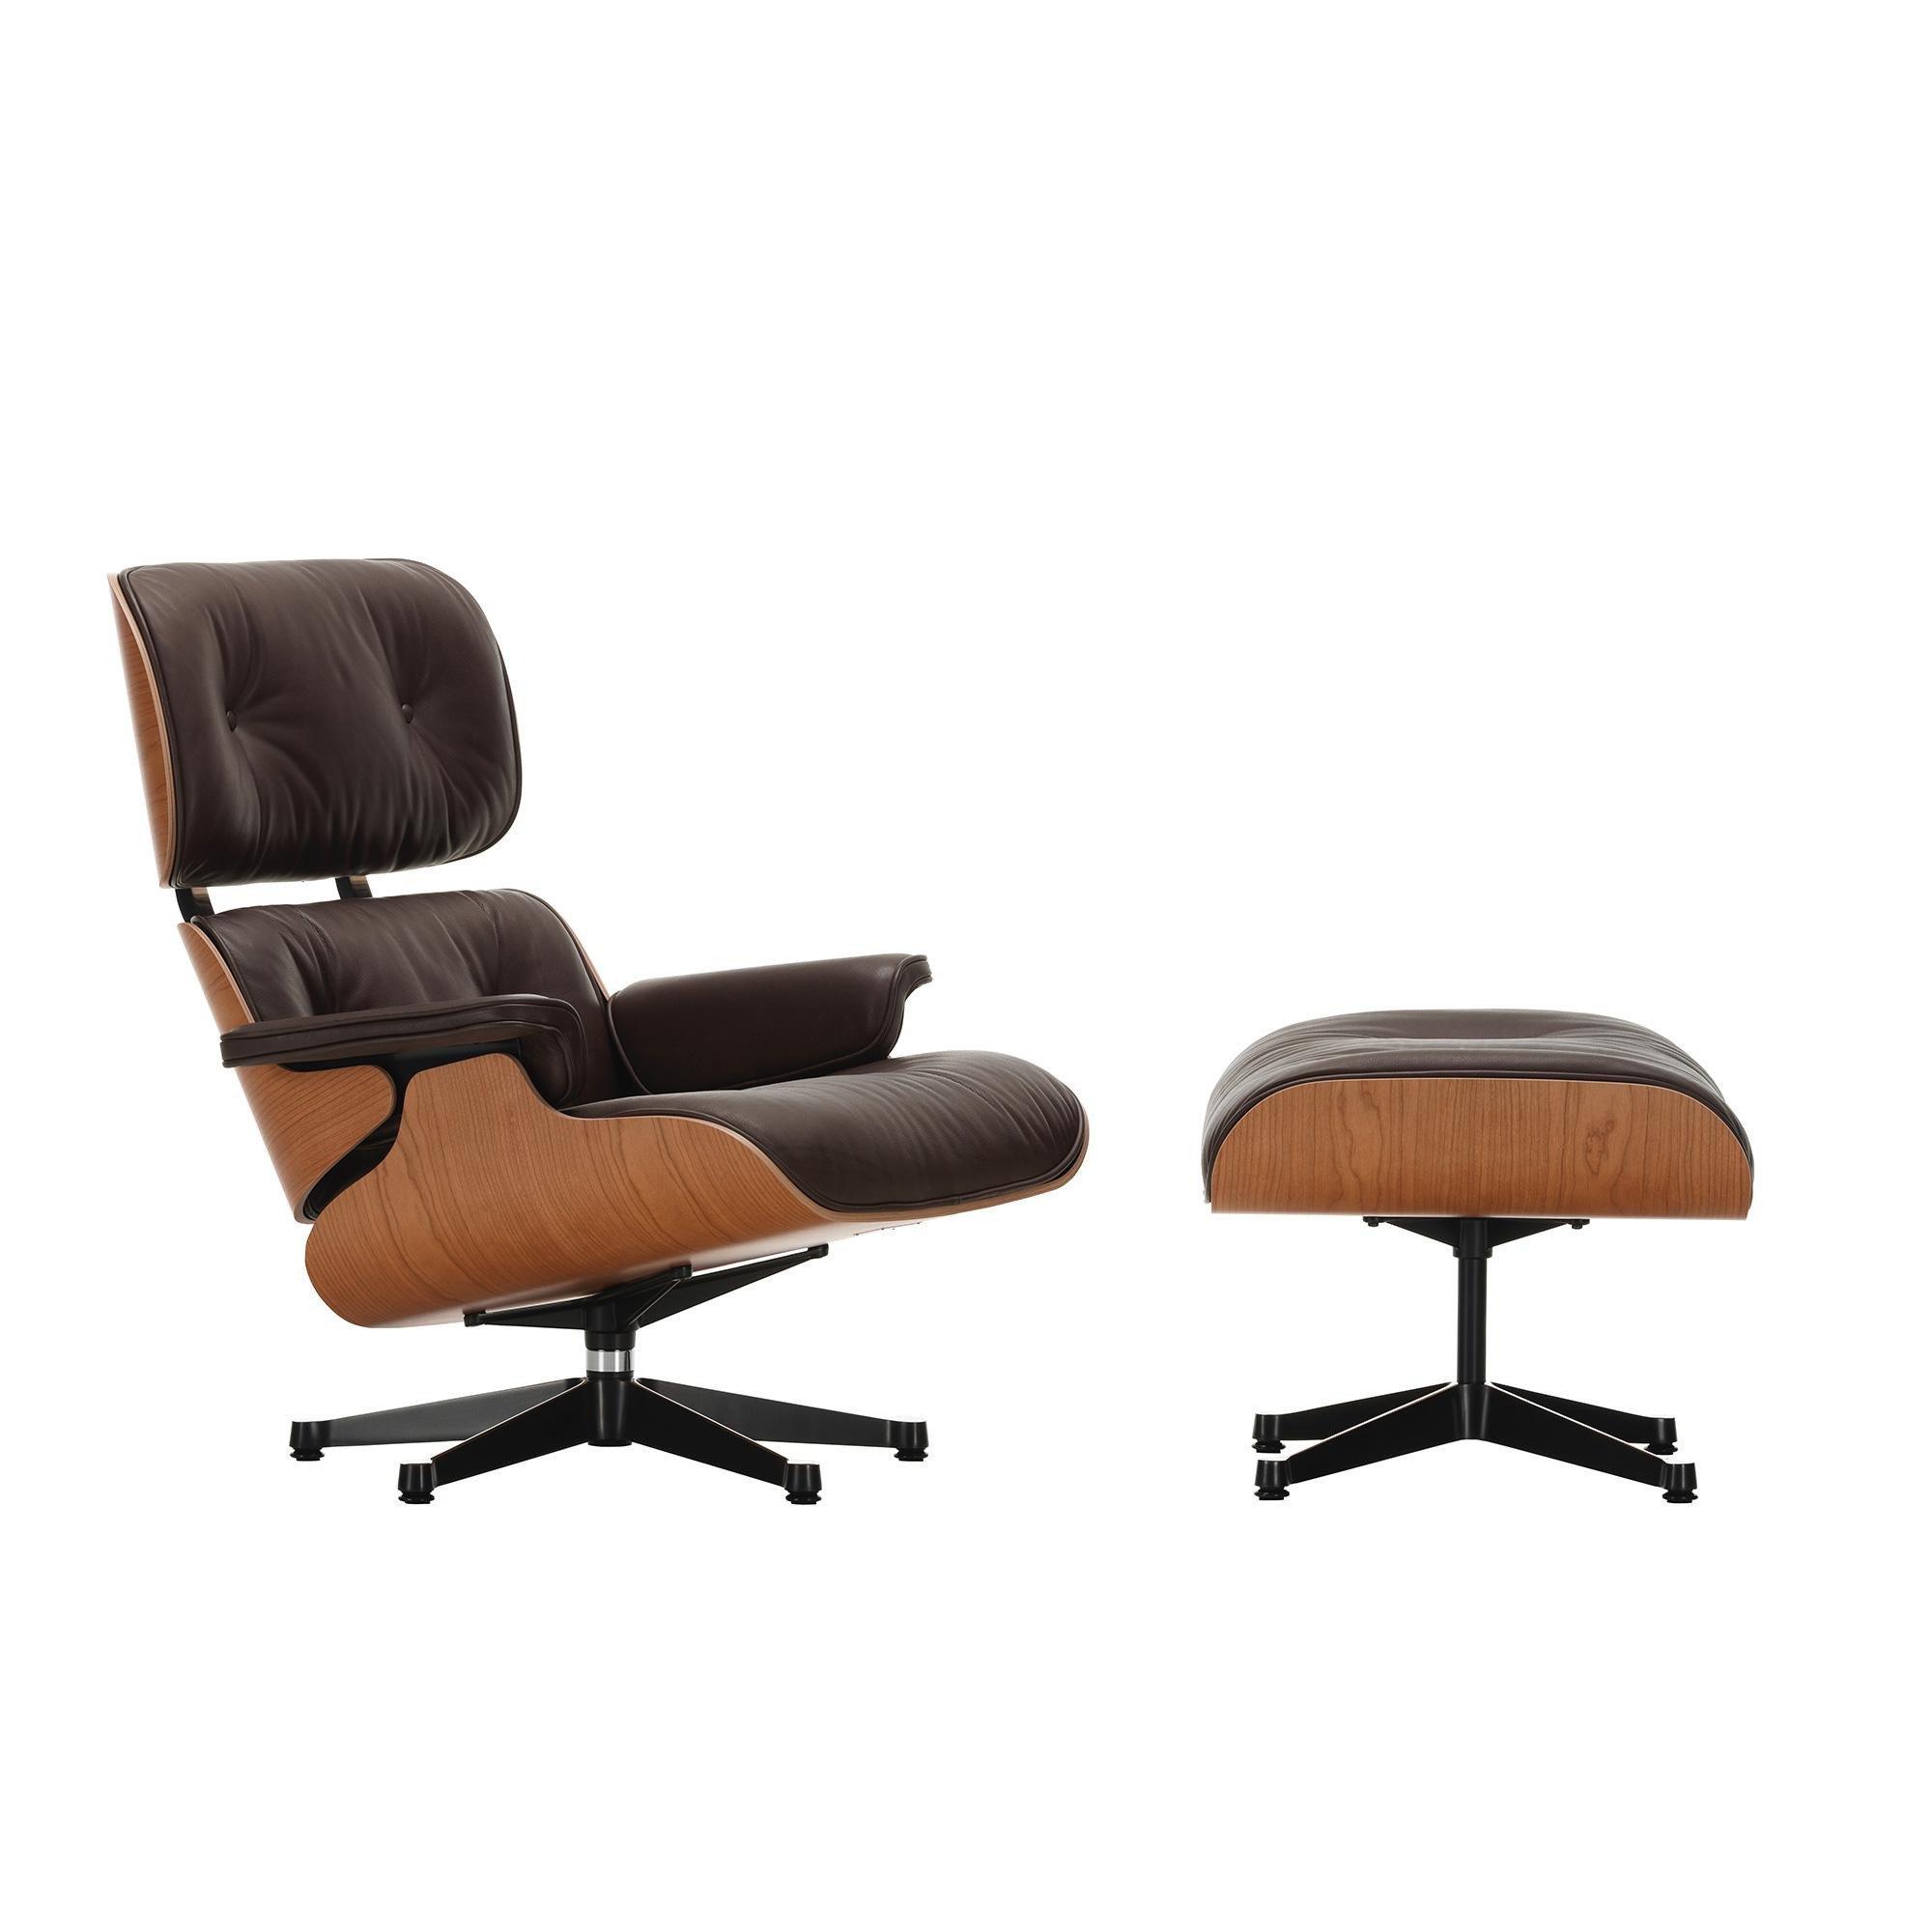 Eames Lounge Chair - Sillón & reposapiés | Vitra | AmbienteDirect.com